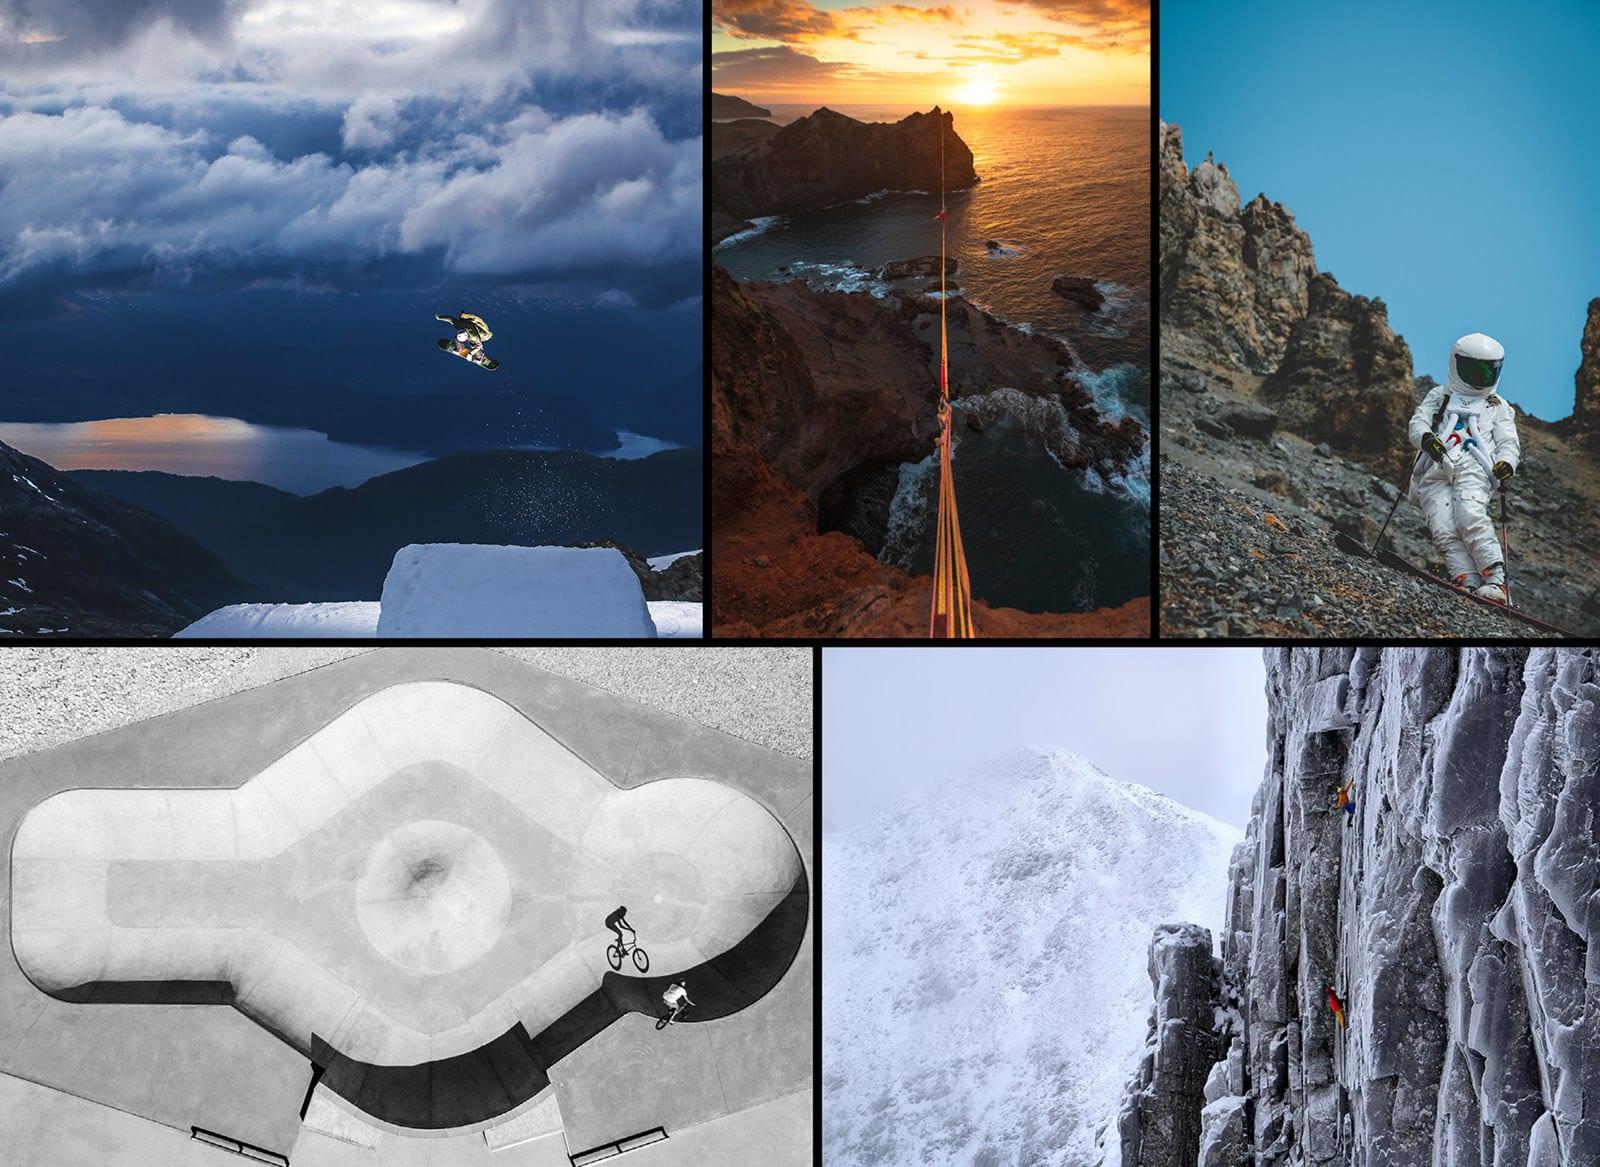 Disse fem actionbildene er finalister i Instagram-kategorien. Foto: © Dasha Nosova, Jeremy Bernard, Fabien Maierhofer, Baptiste Fauchille, Hamish Frost / Red Bull Illume